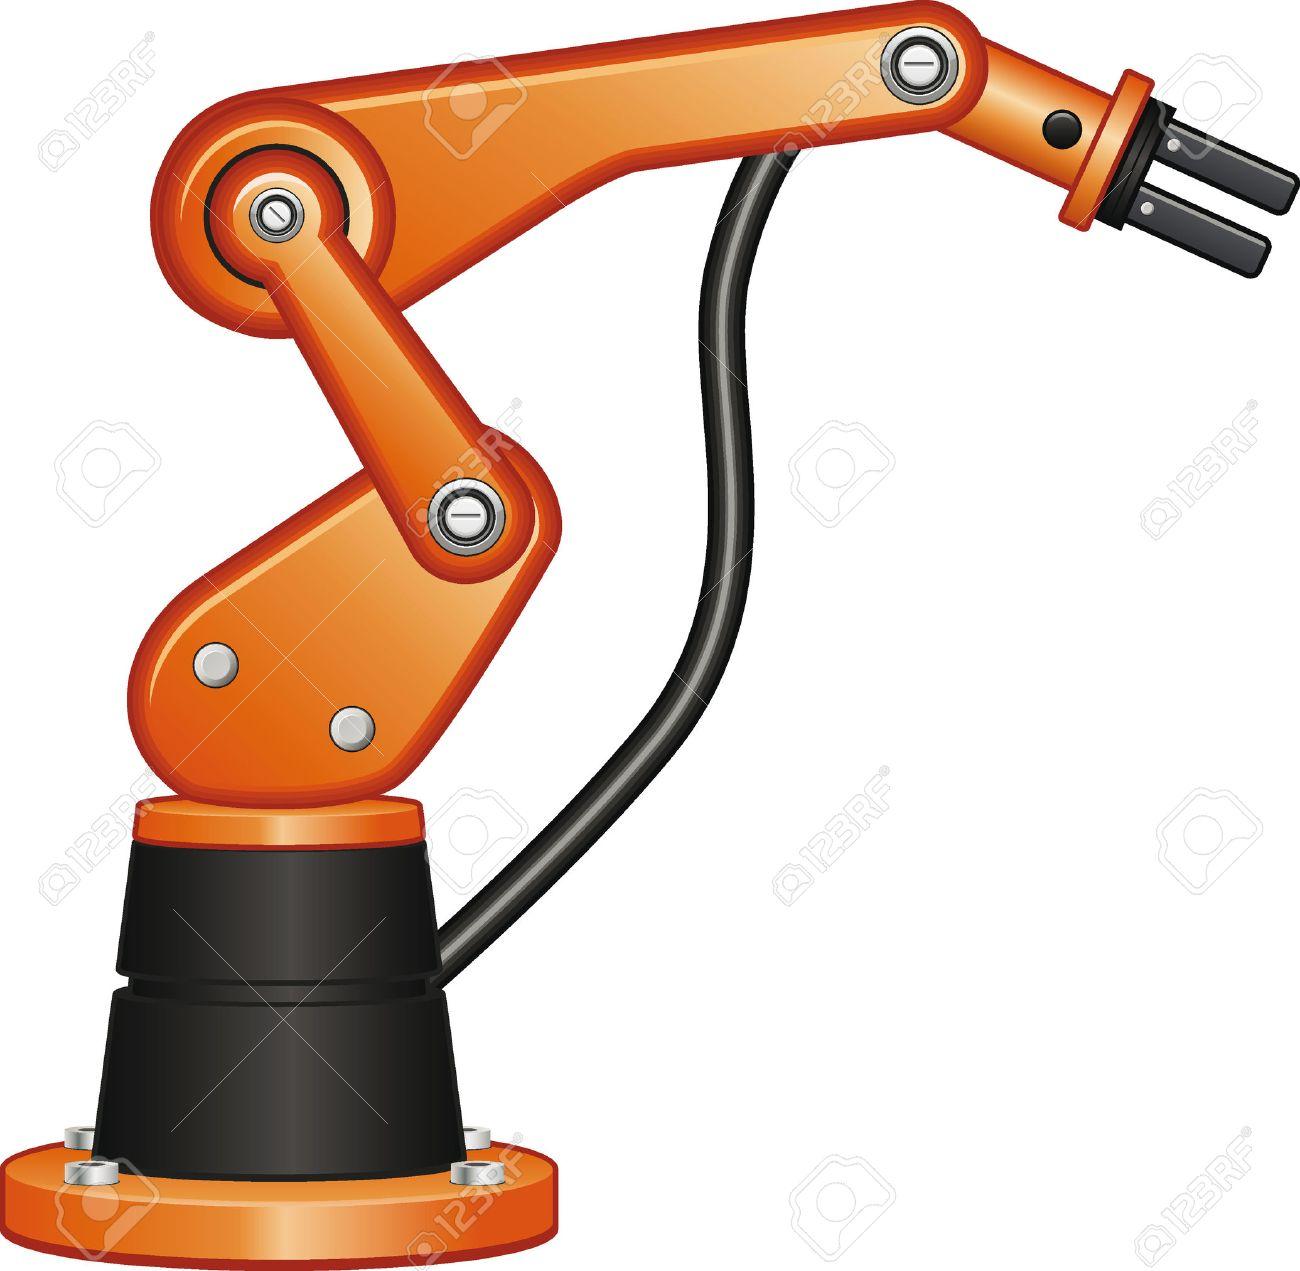 Robot arm clipart 1 » Clipart Station.